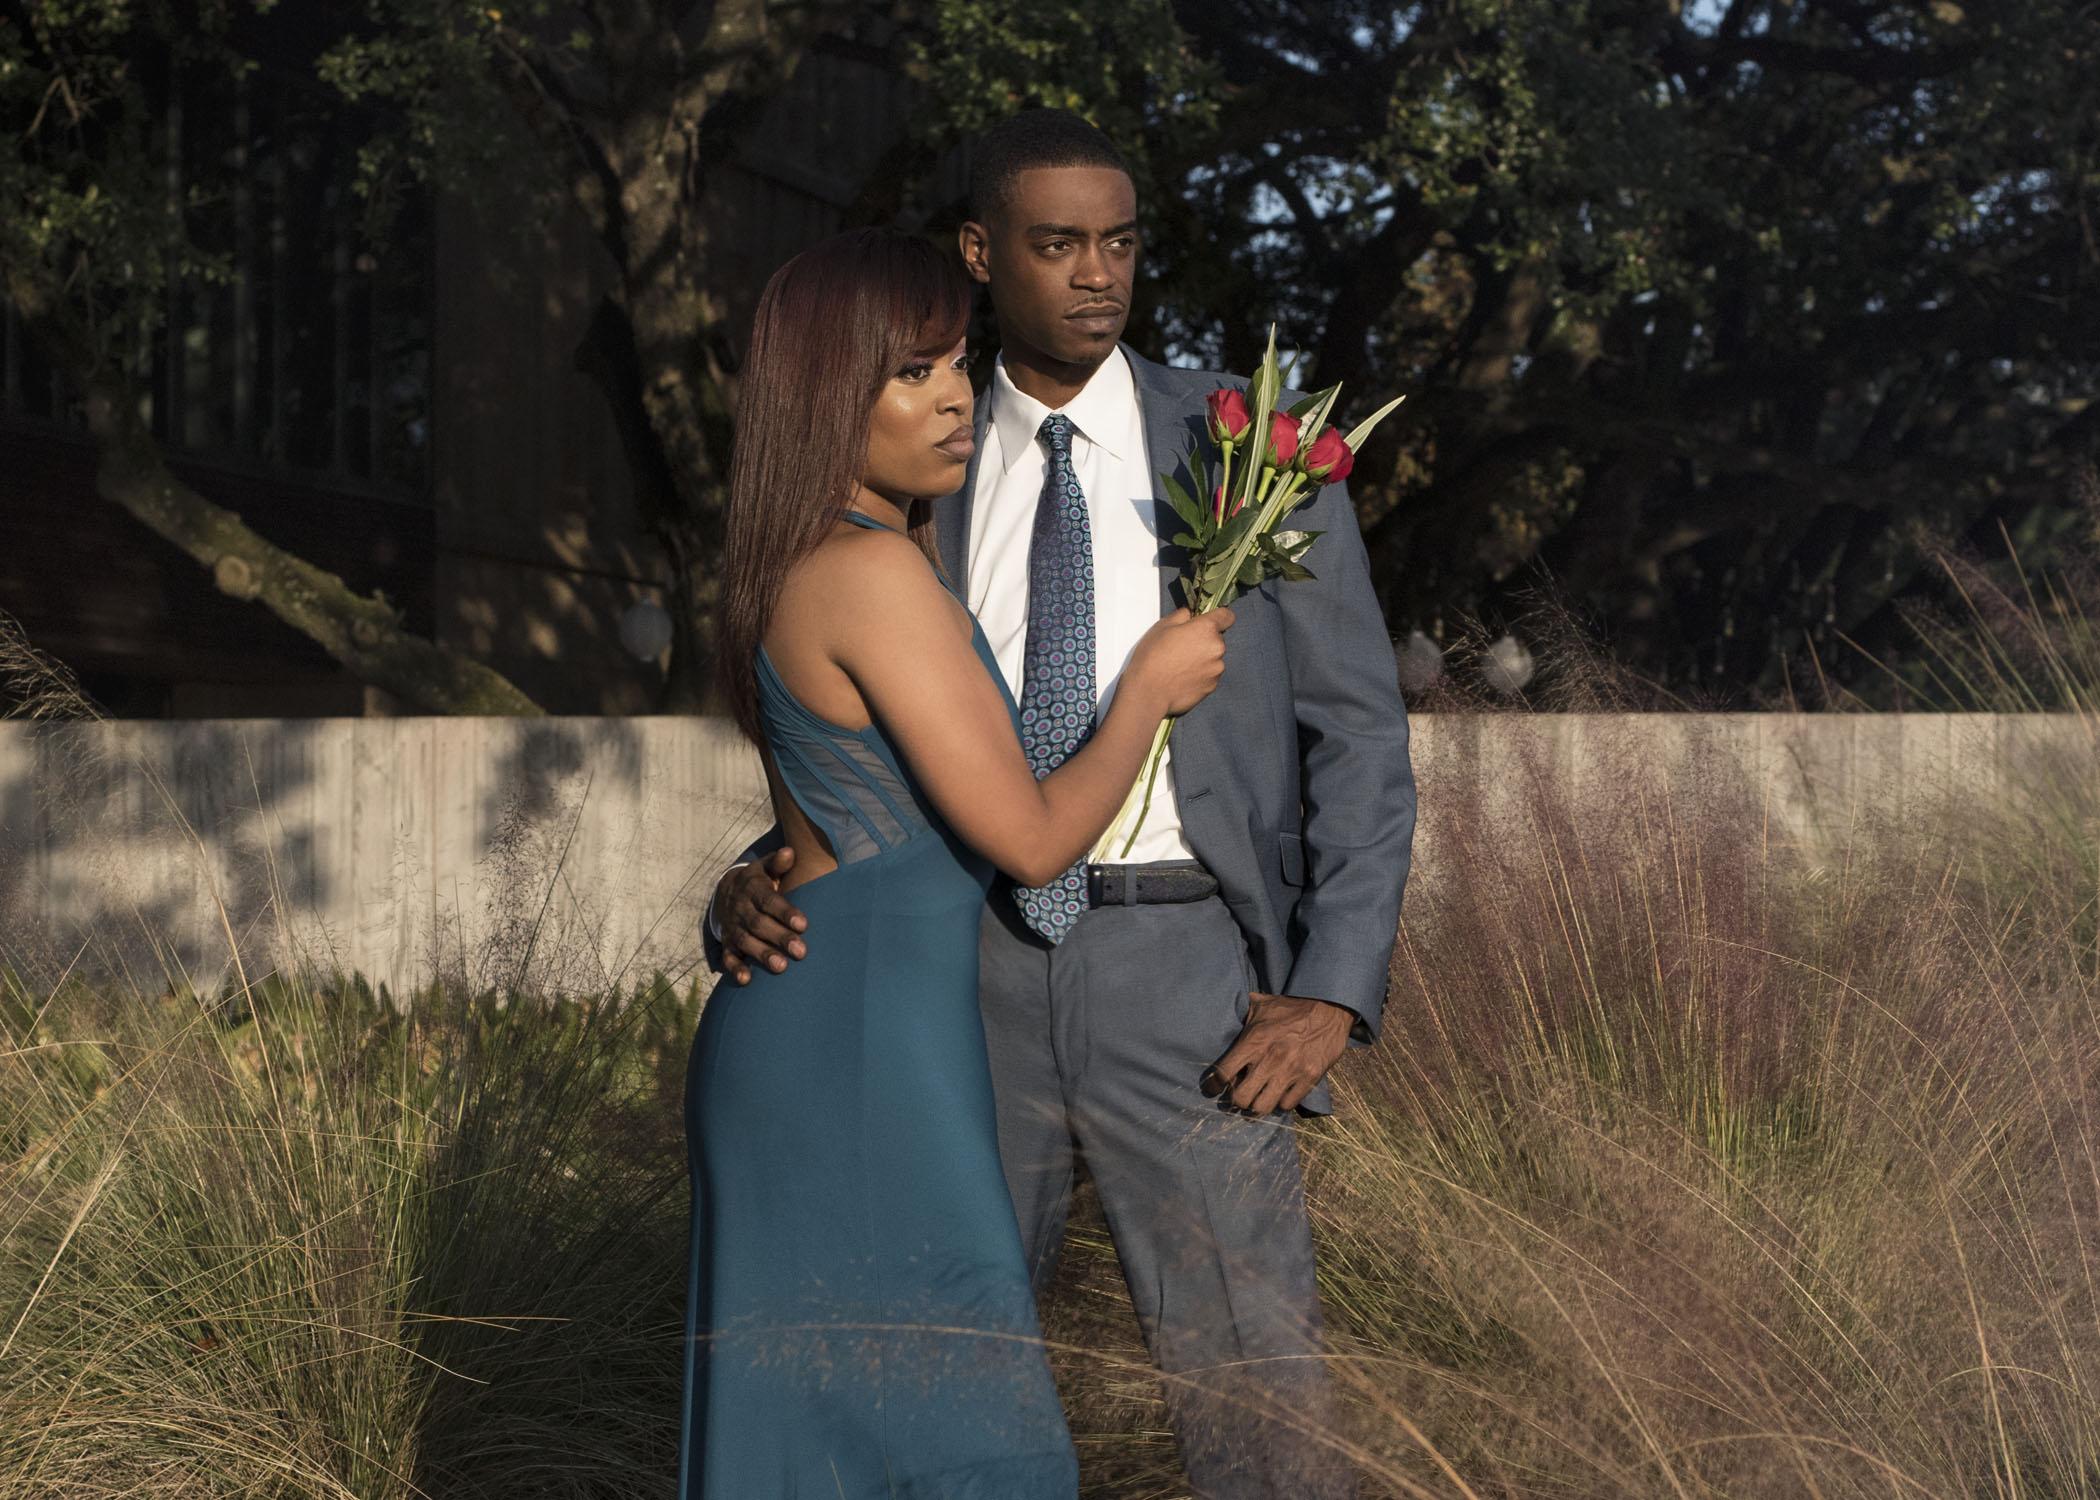 - NOW BOOKING 2019 & 2020 WEDDINGS